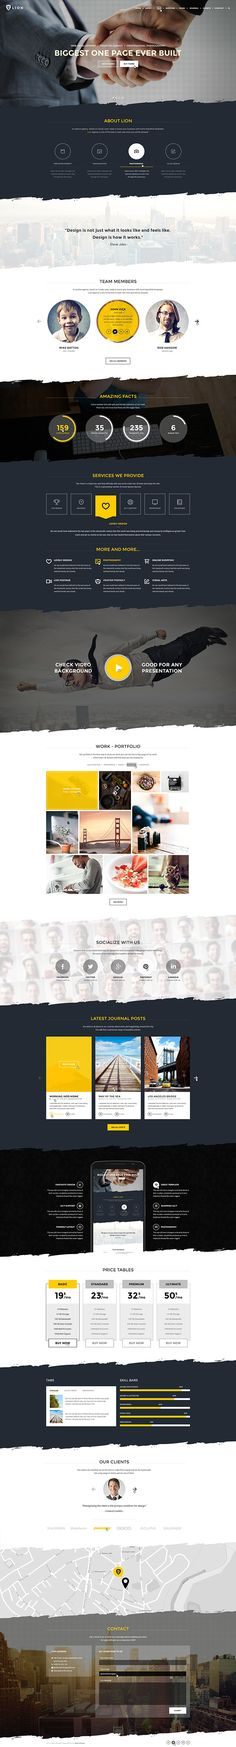 https://www.behance.net/gallery/22262223/Lion-Multipurpose-One-Page-Template